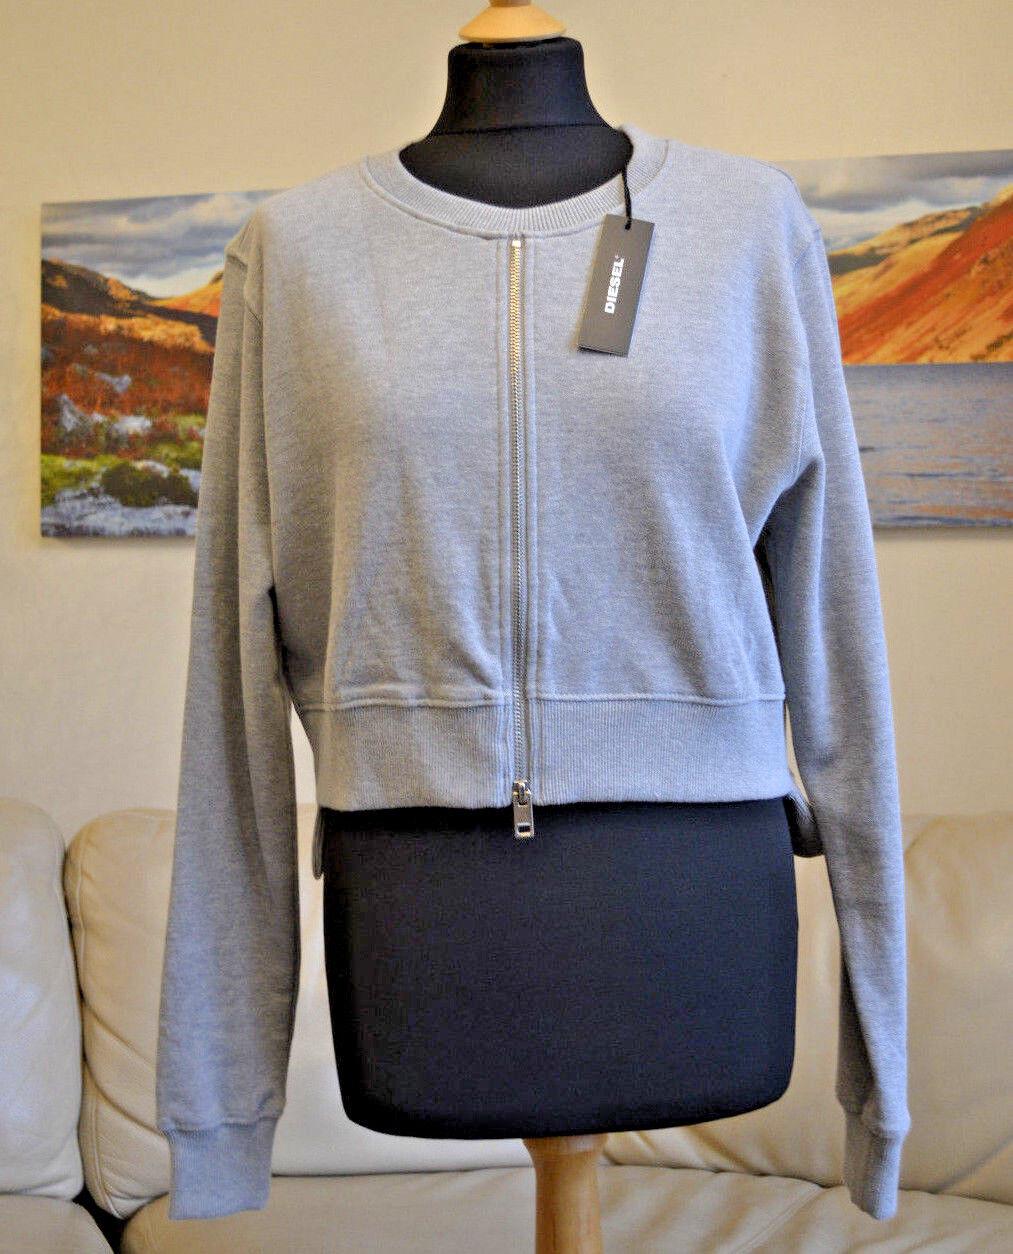 DIESEL Womens Top Jumper Sweater Crop Oversized Light Grey Cotton Sz XS